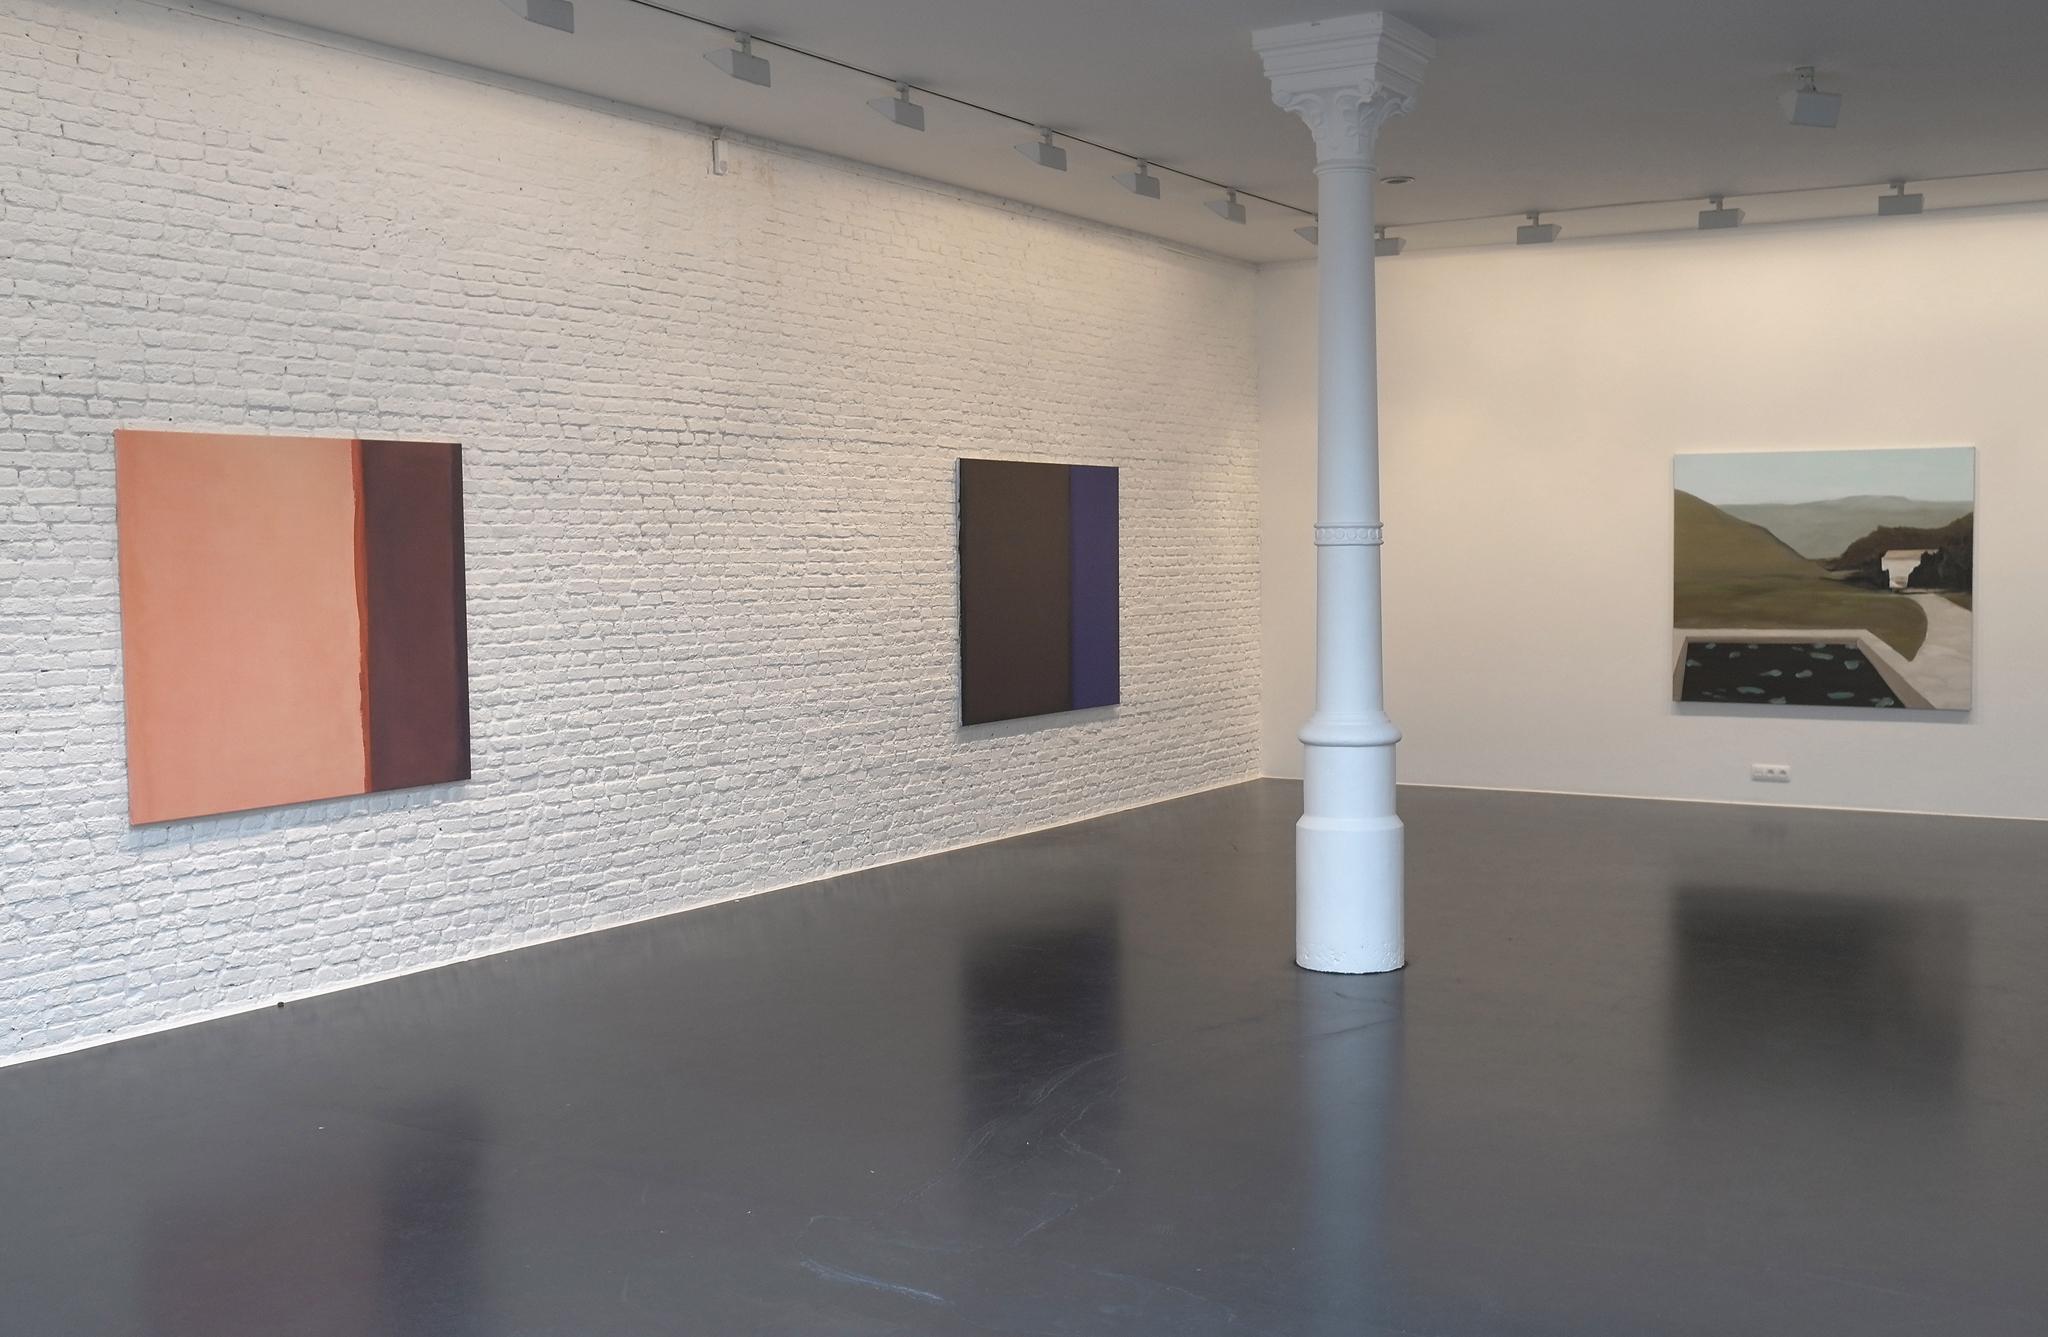 Upcoming exhibition Antwerp 26/04/2018